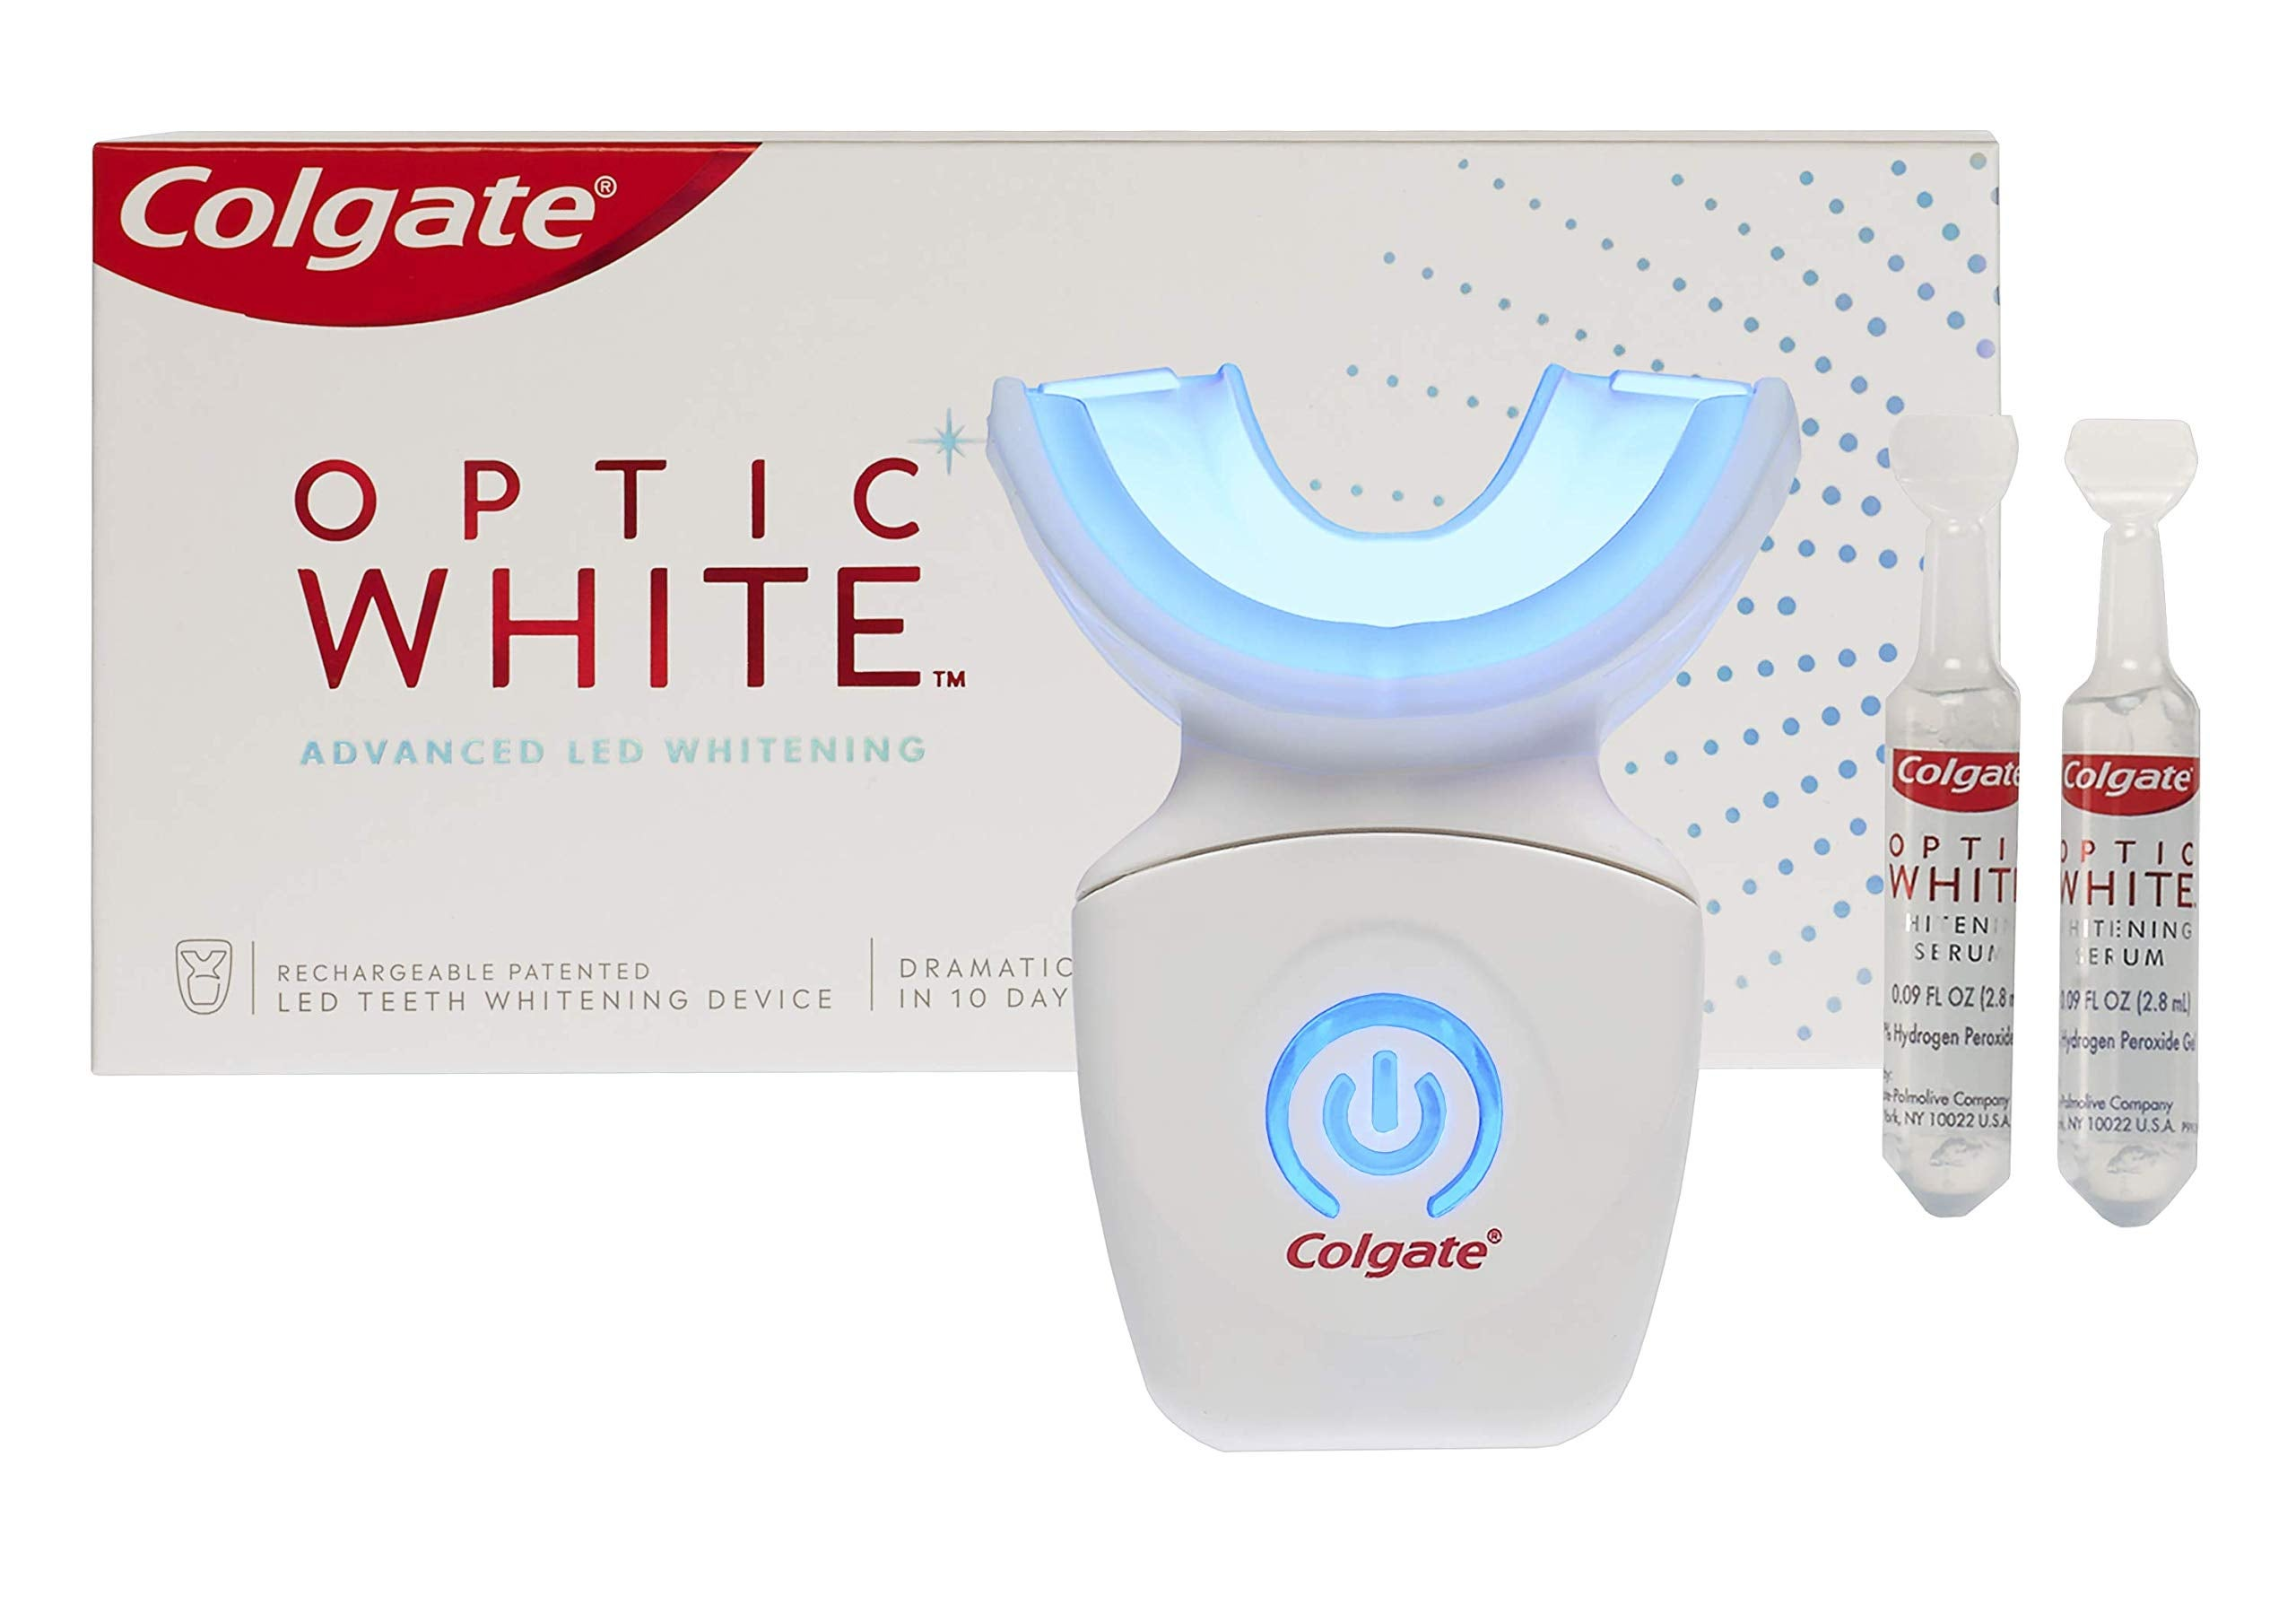 Colgate Optic White Advanced Teeth Whitening Kit